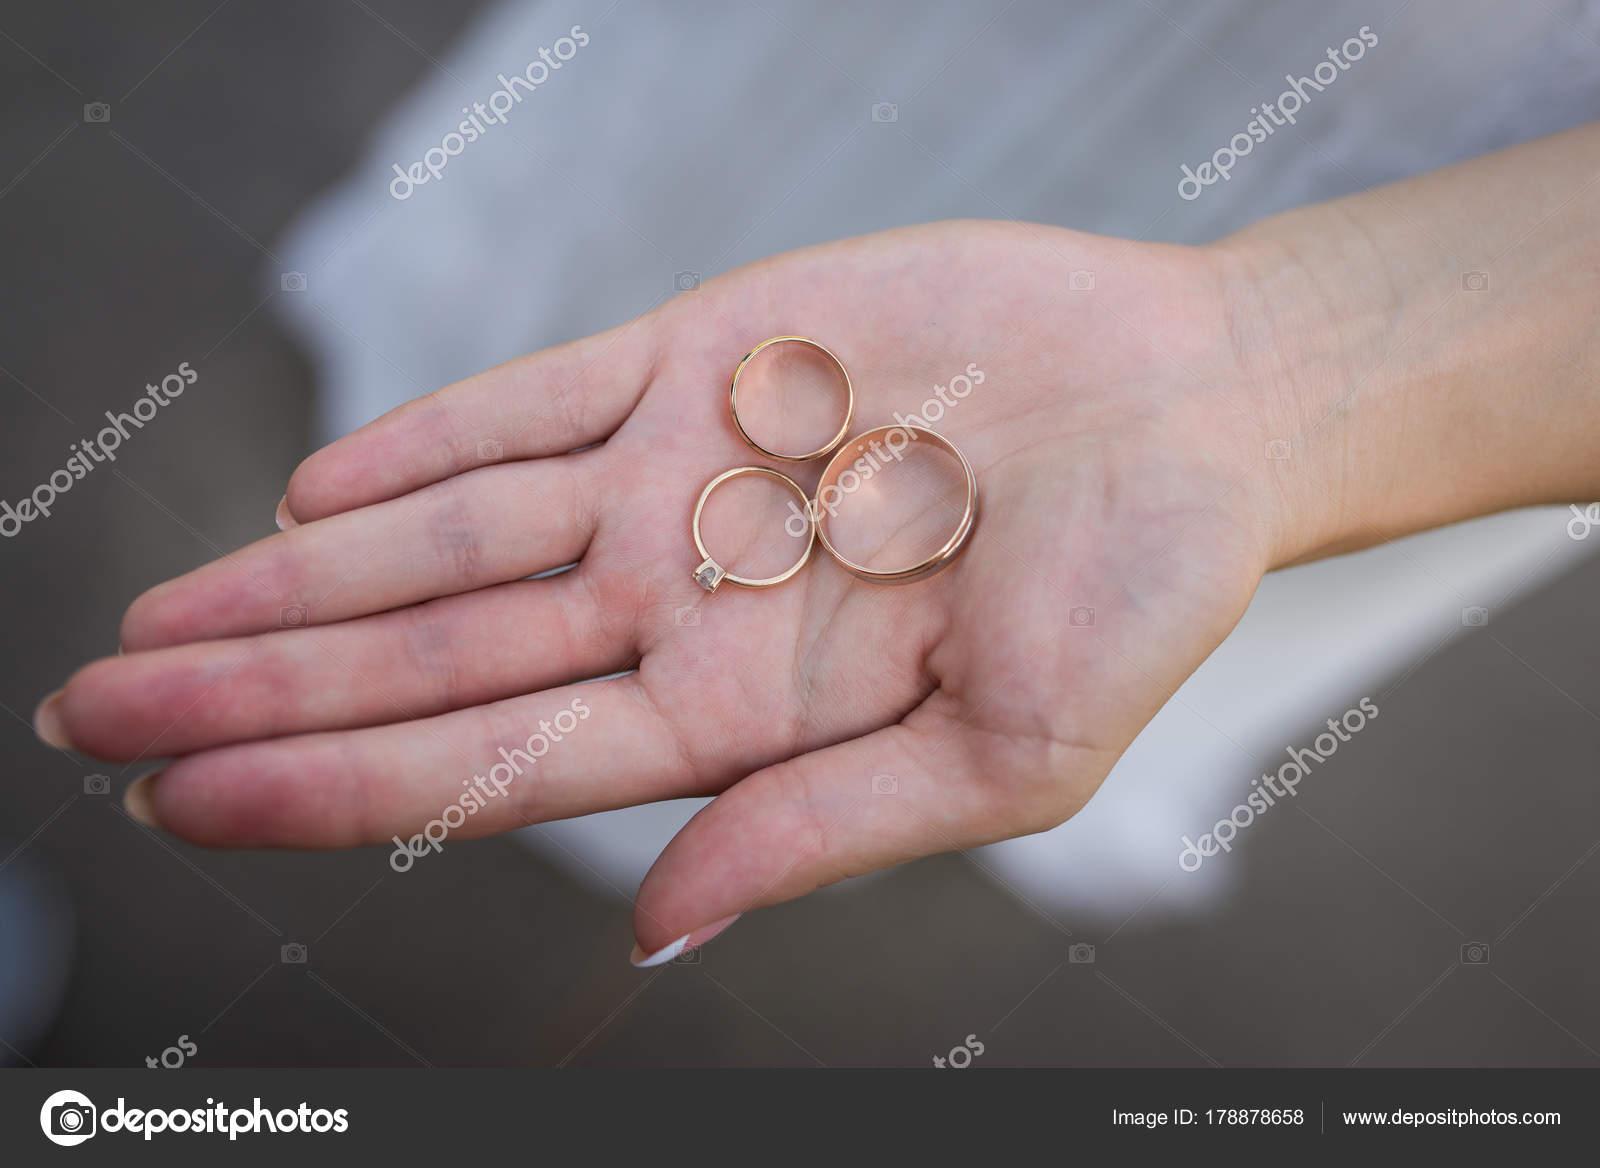 Closeup Golden Wedding Rings Engagement Ring Hands Woman Bride ...